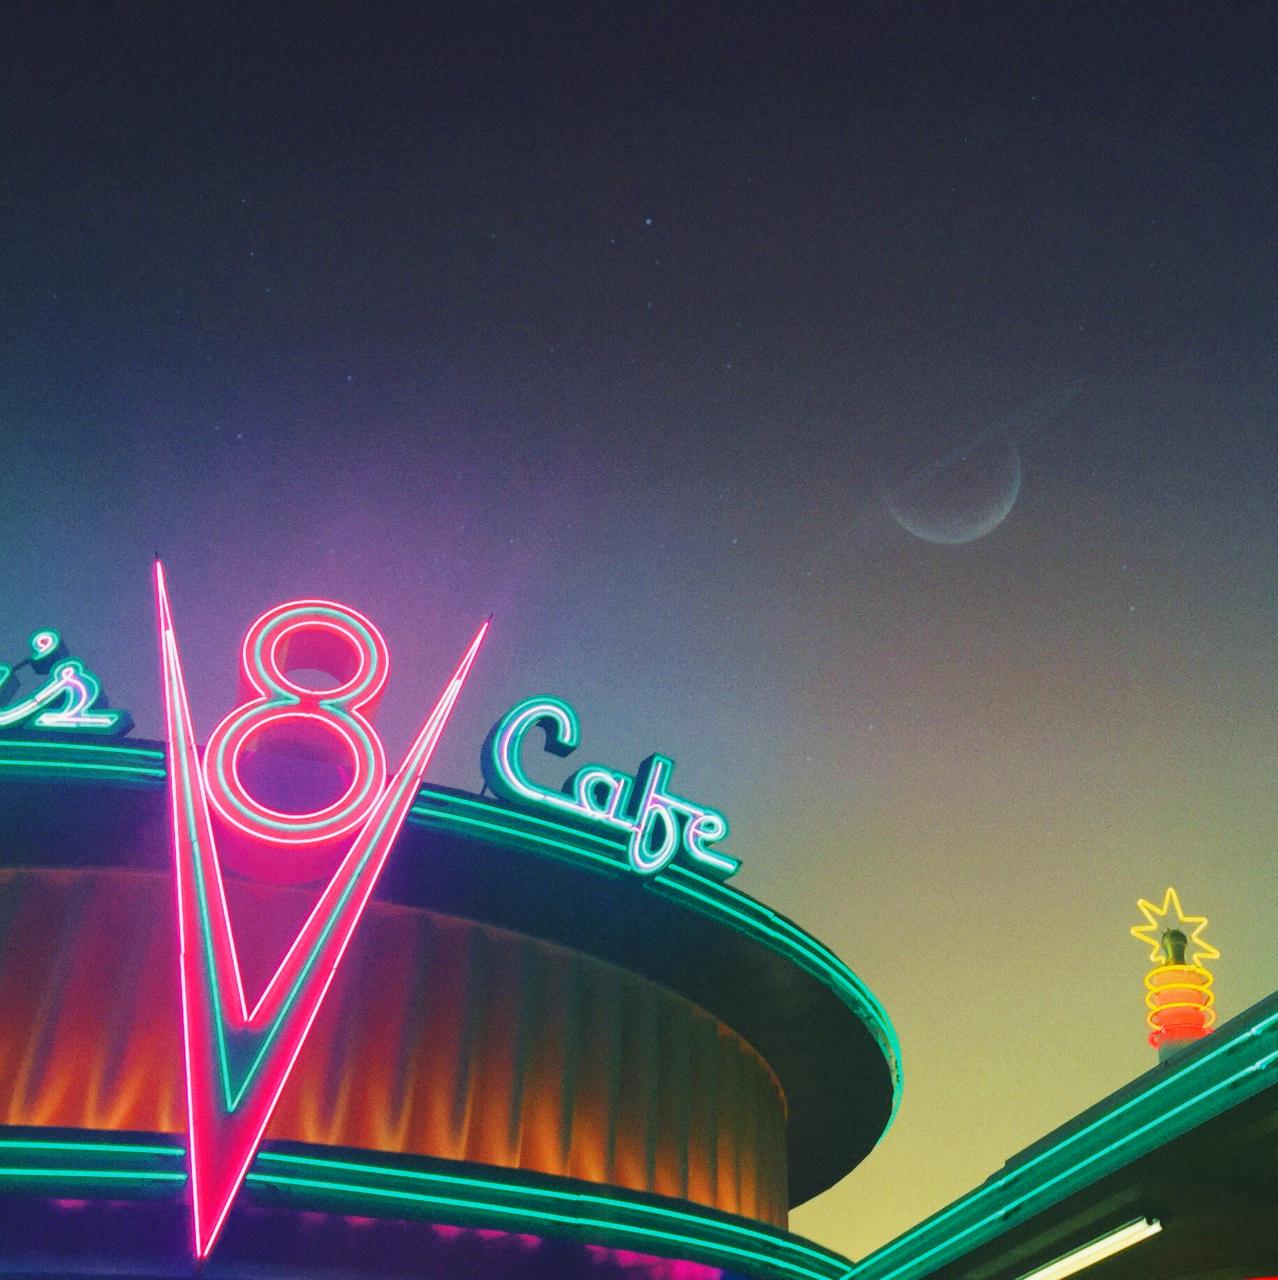 best burgers in the galaxy.jpg